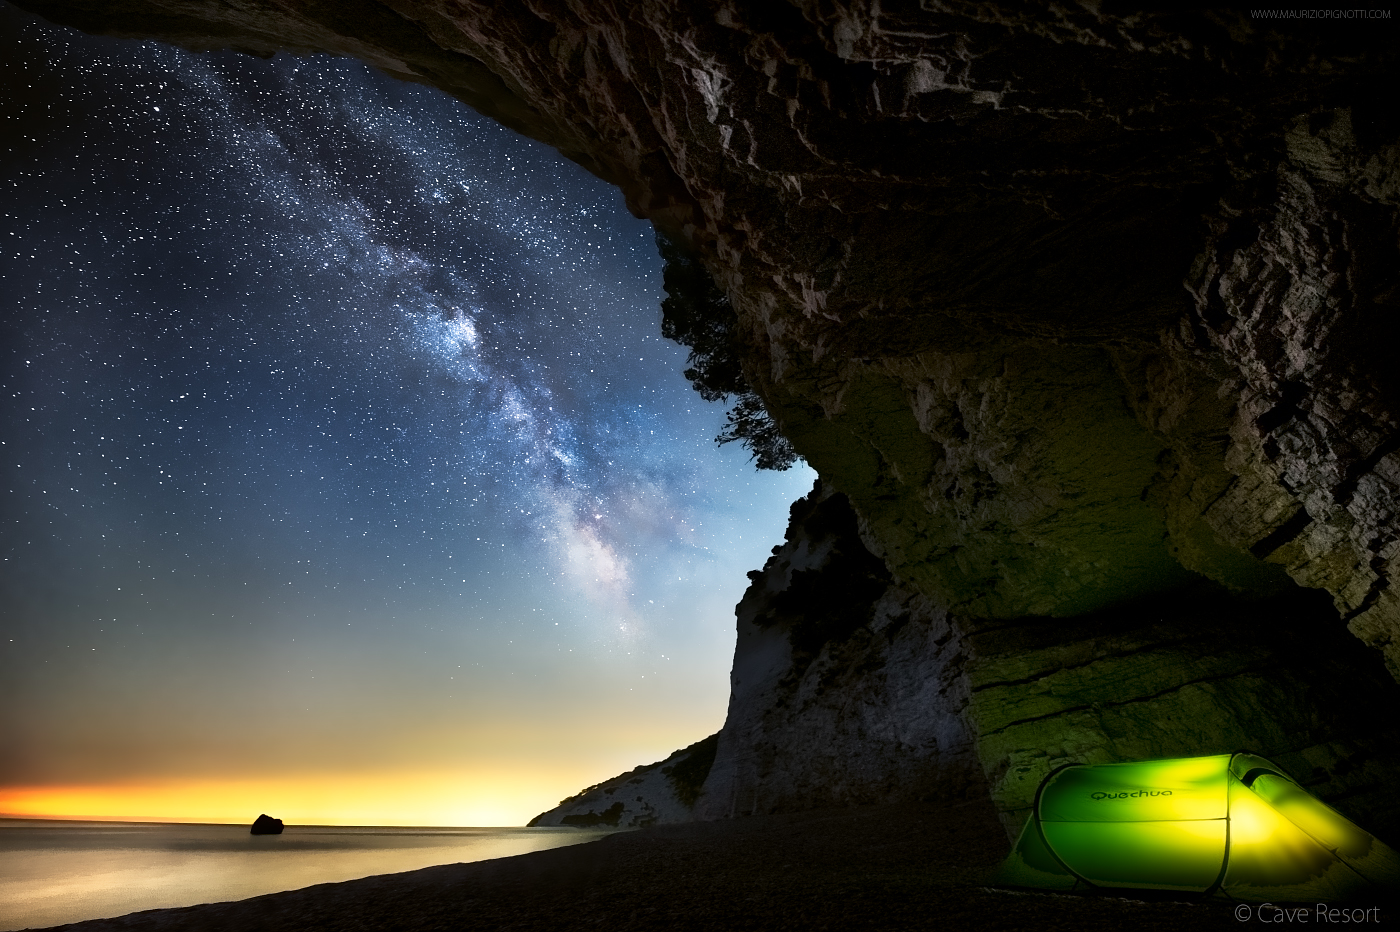 %C2%A9-Cave-Resort-PORTFOLIO.jpg